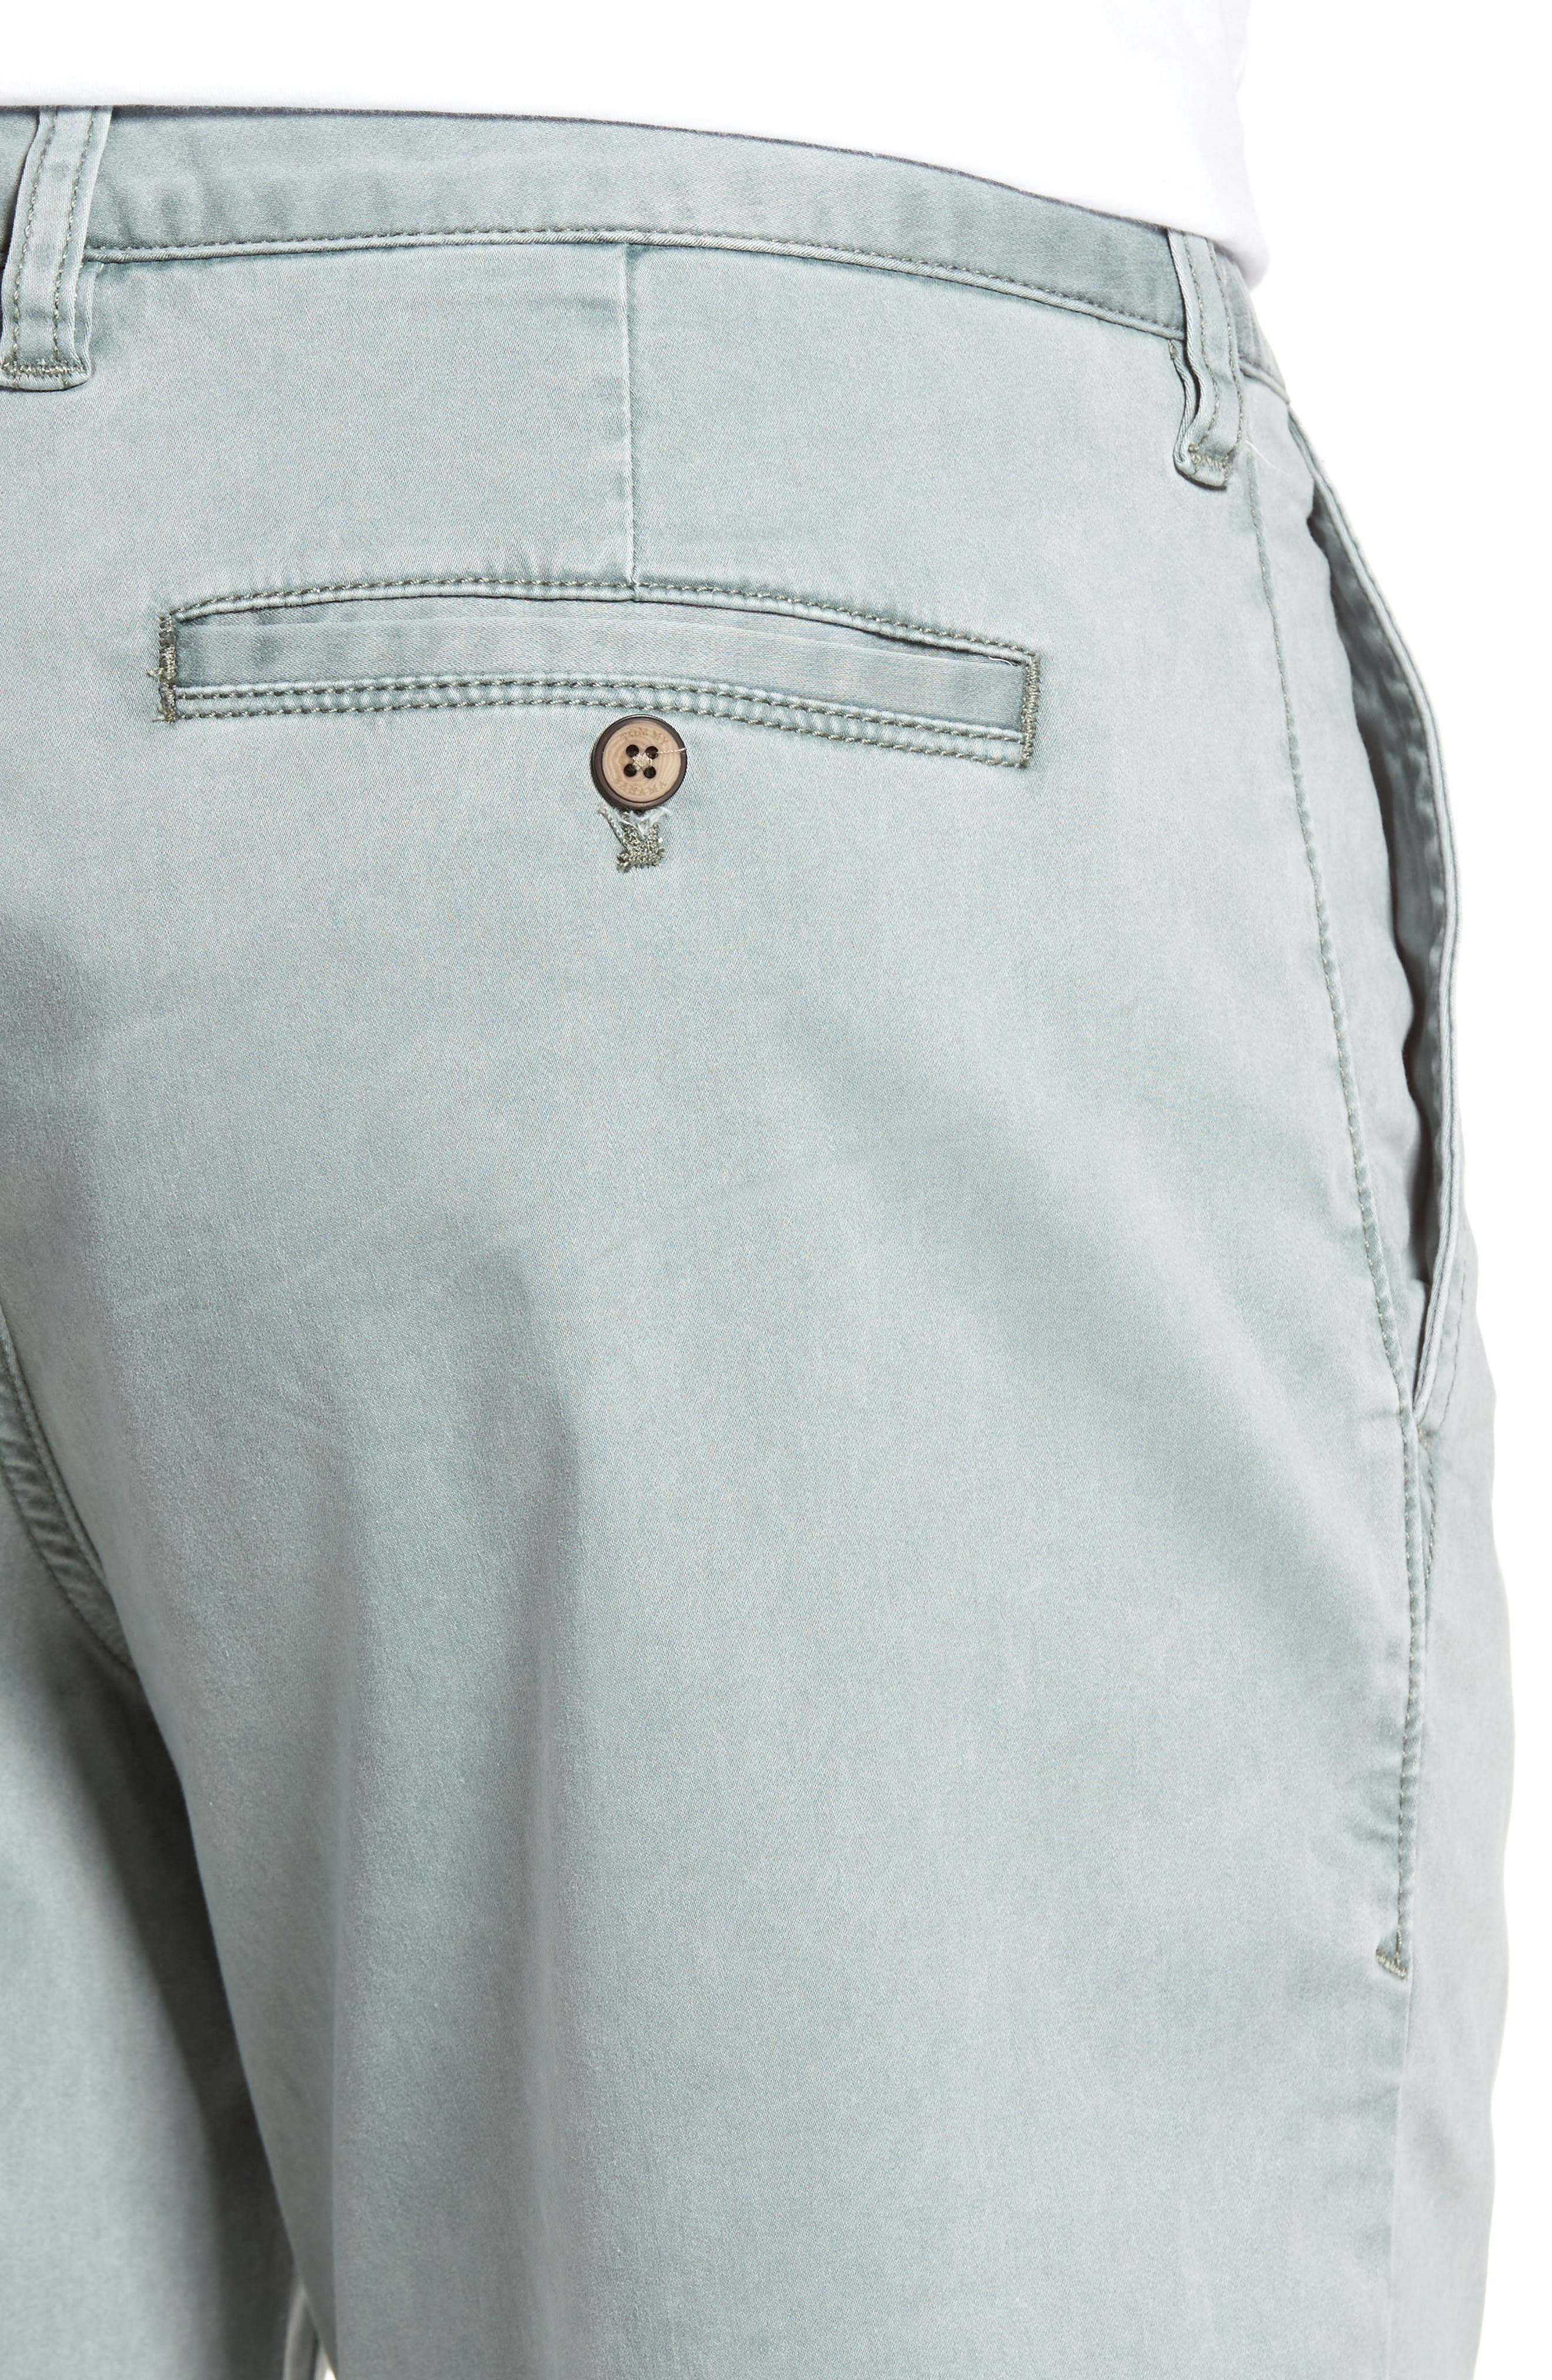 Boracay Chino Shorts,                             Alternate thumbnail 32, color,